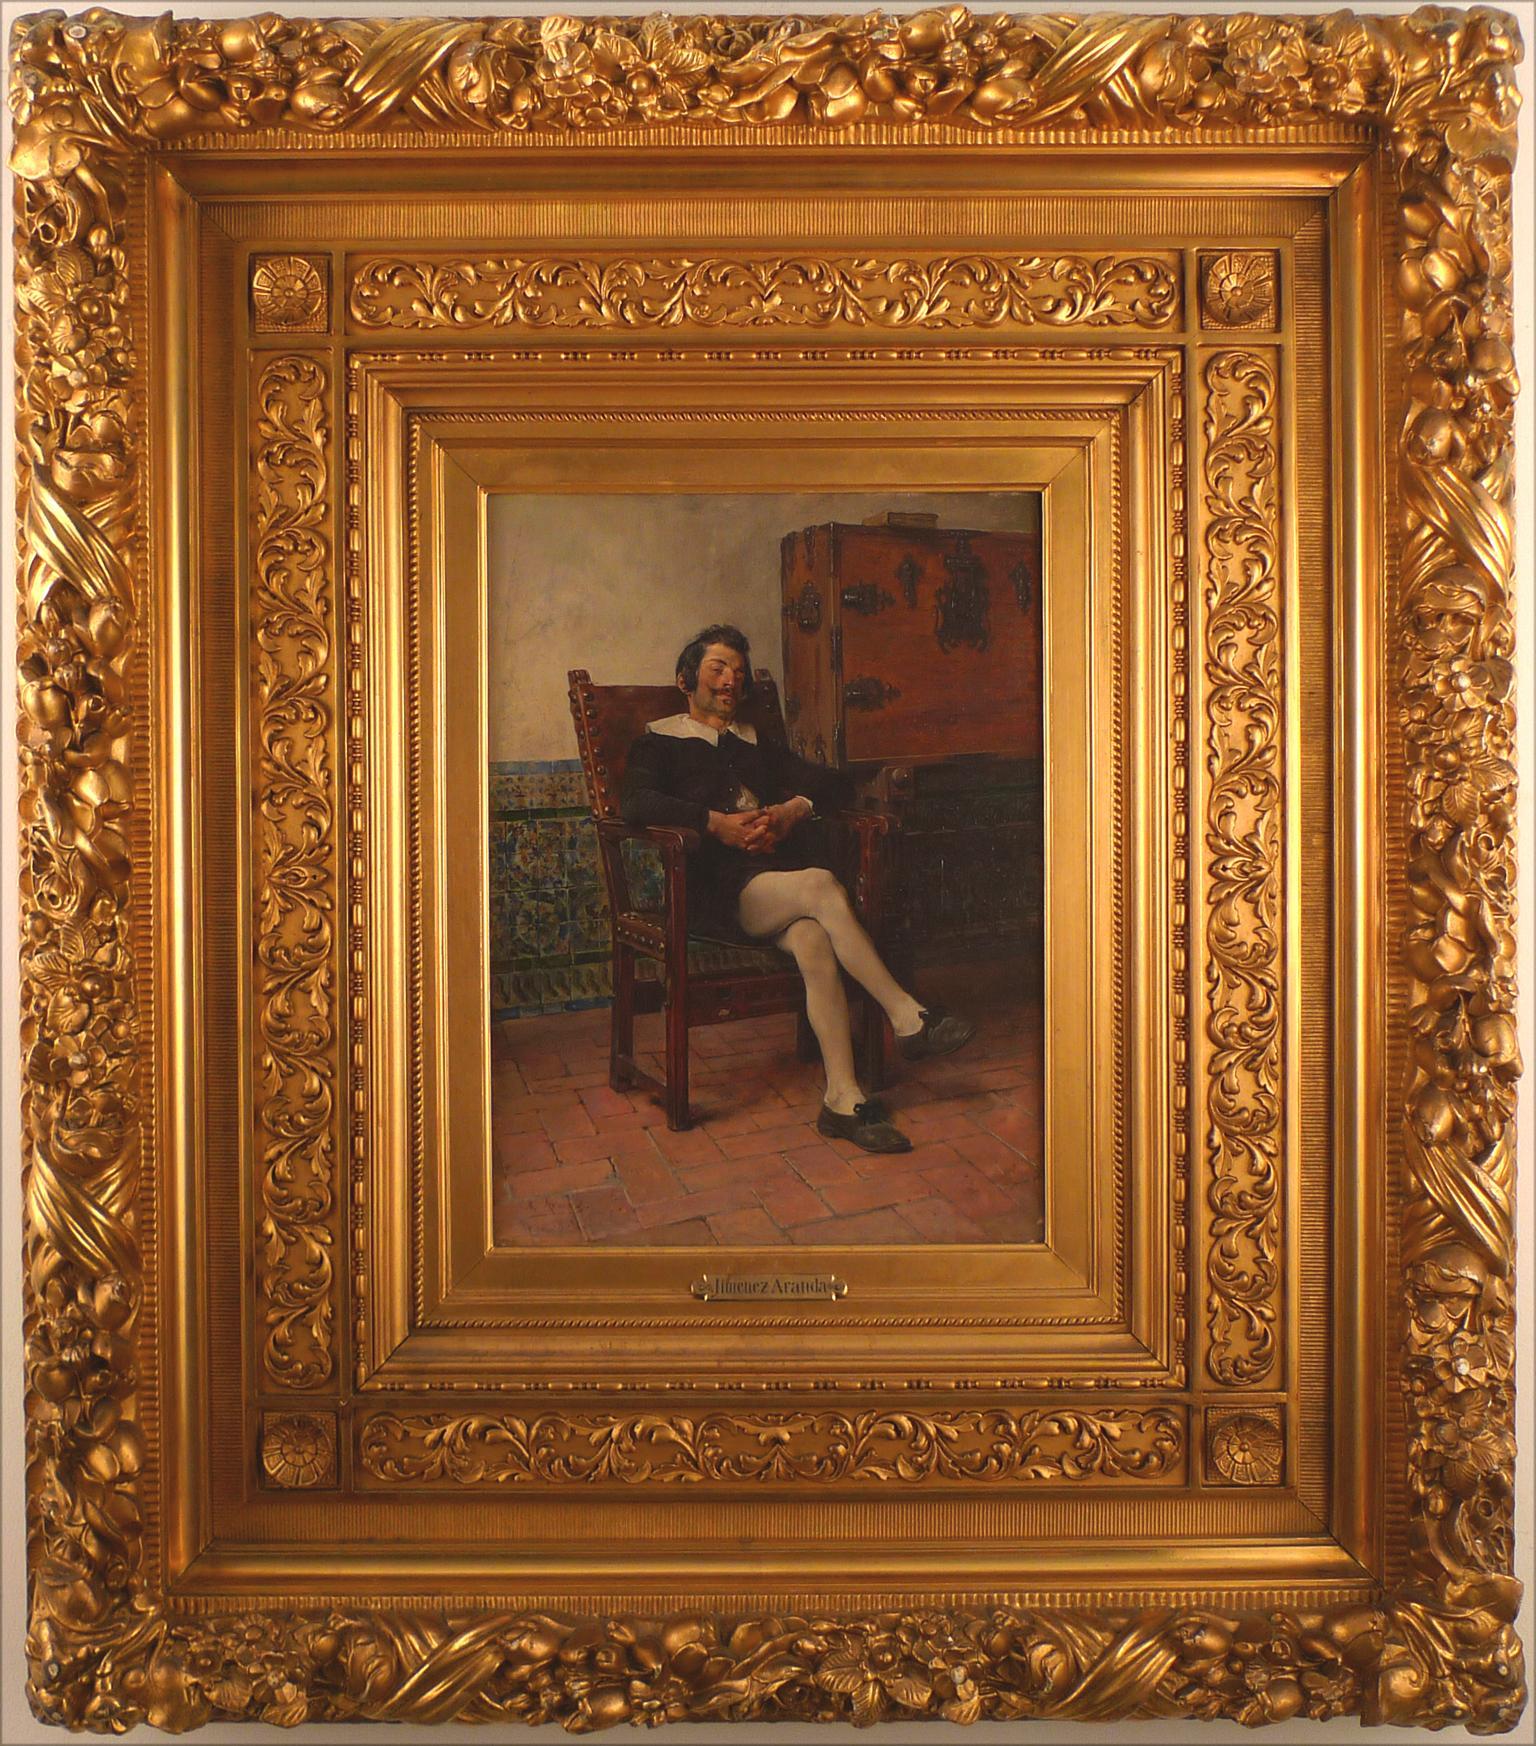 """A Moment of Repose, 1884"" 19th Century Oil on Wood Panel by José Jiménez Aranda"